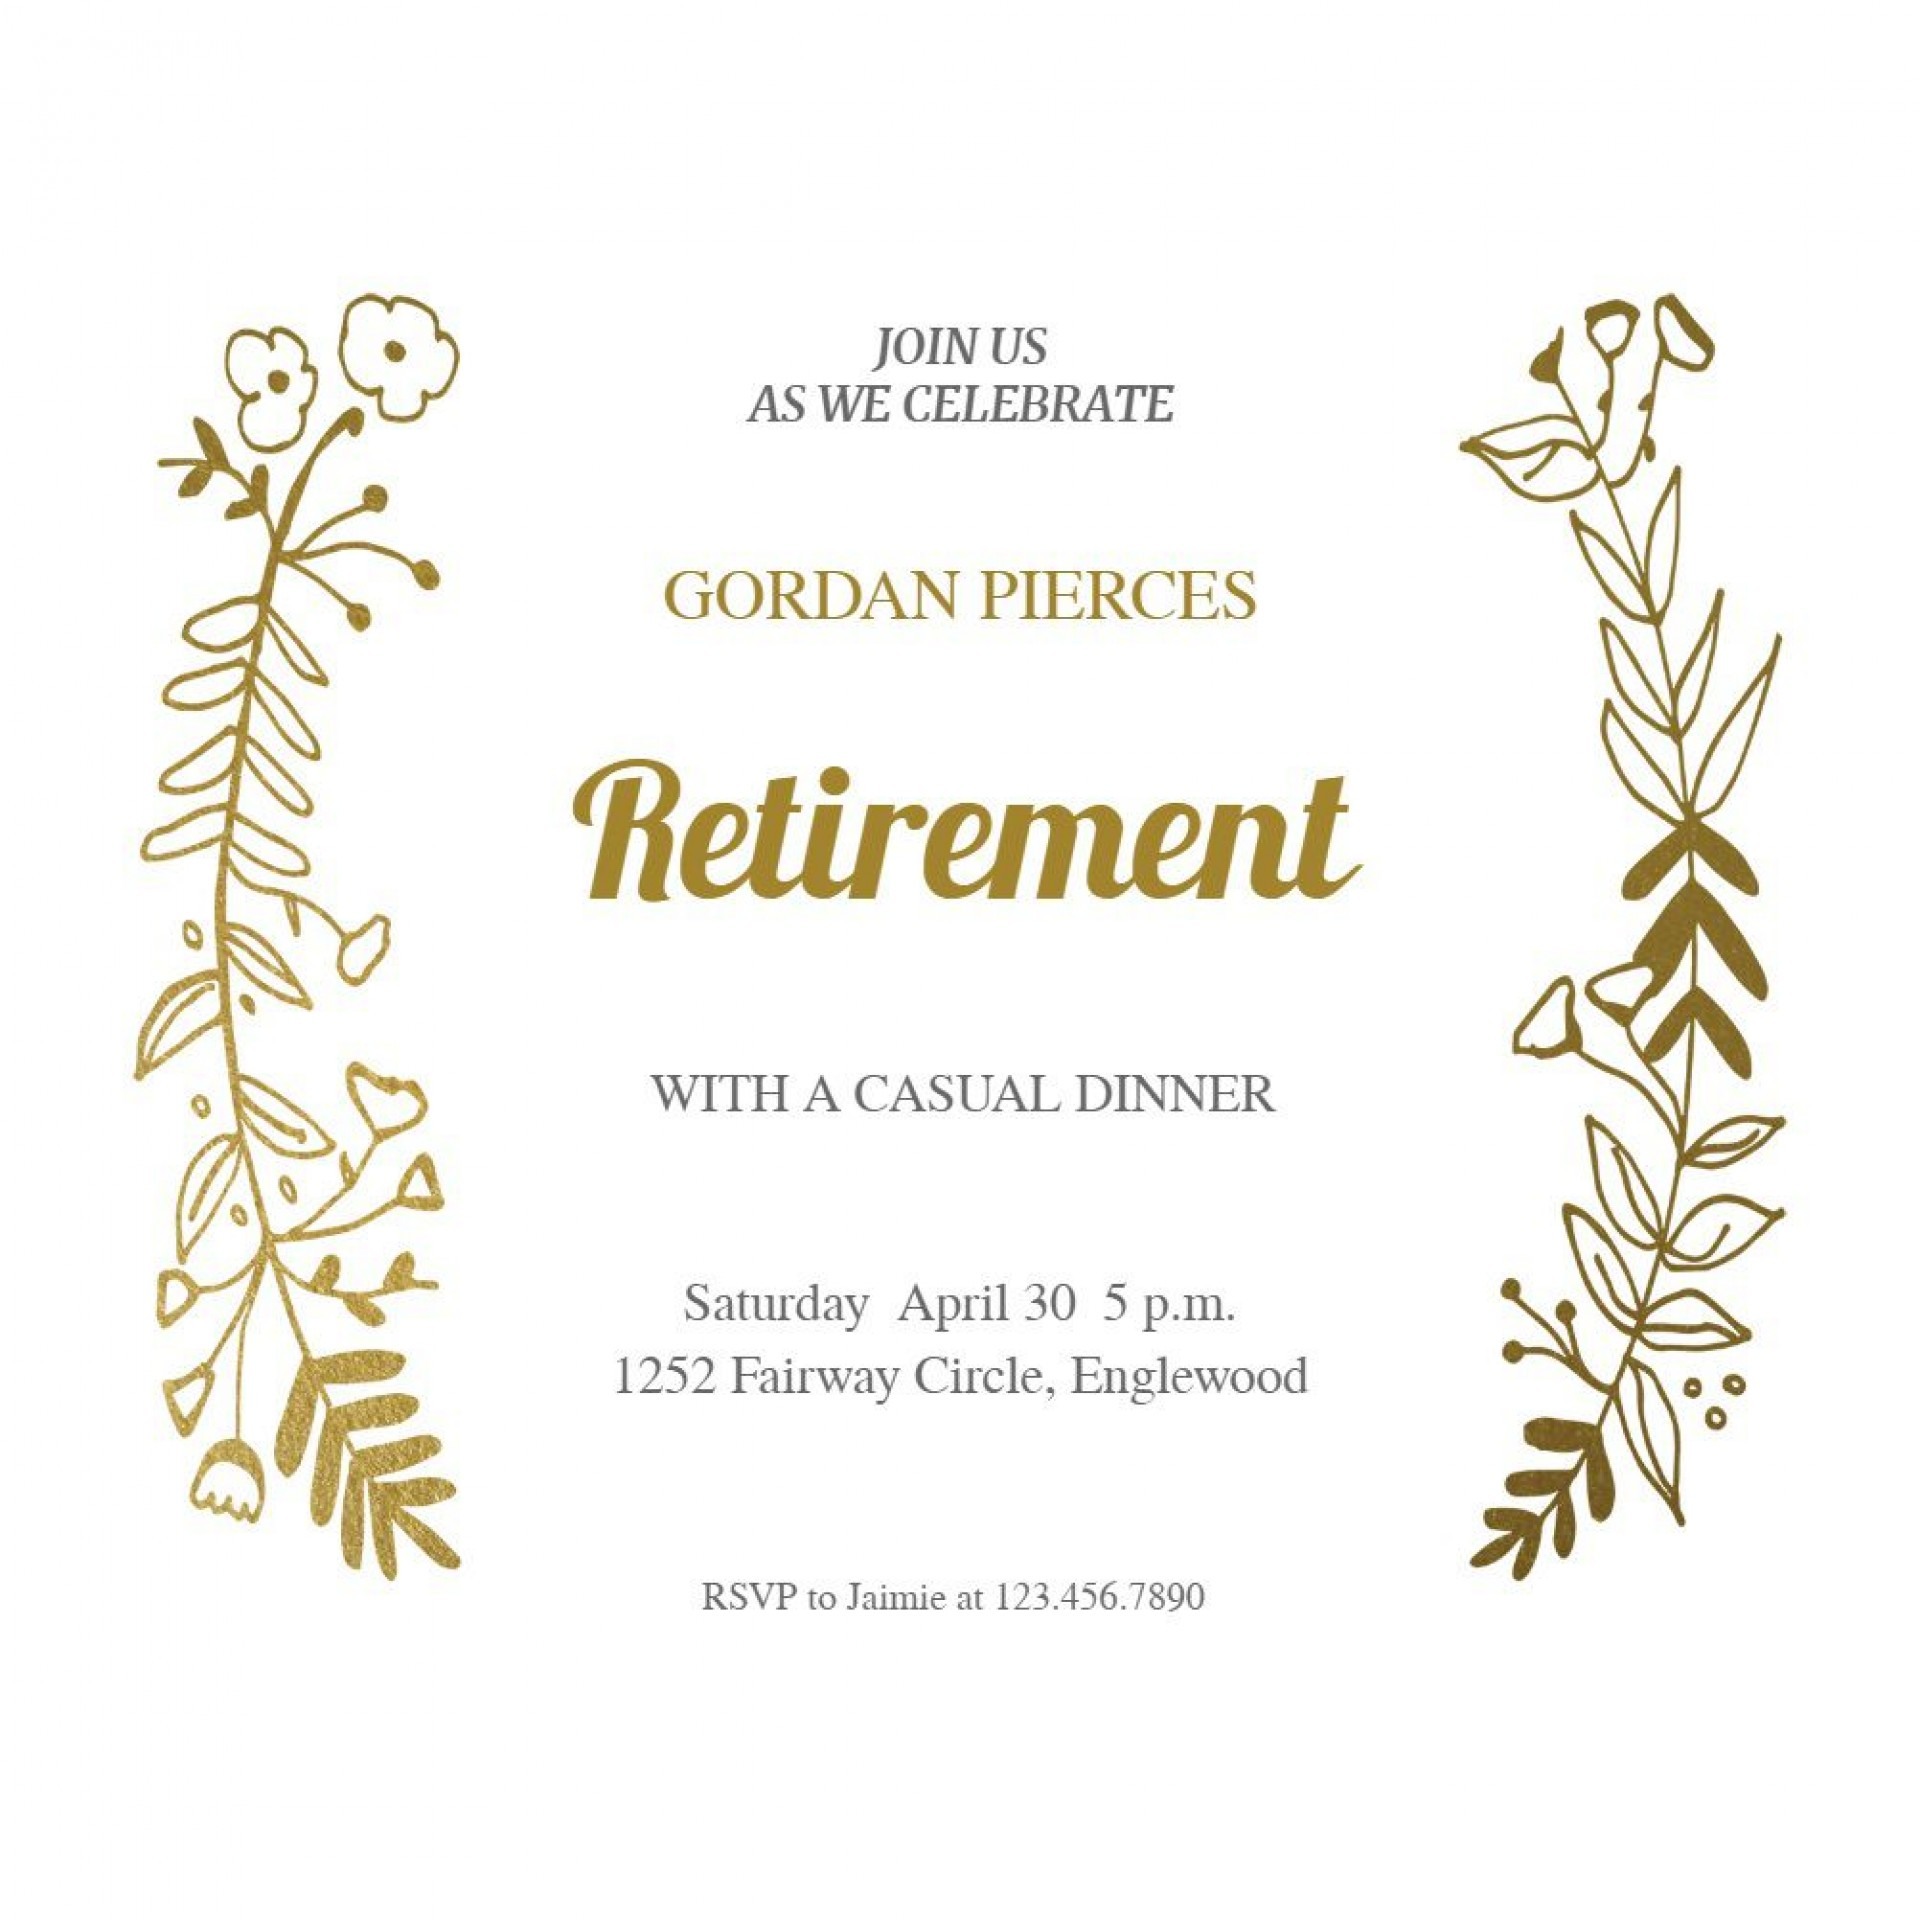 003 Unique Free Retirement Invitation Template Picture  Templates Microsoft Word Party Flyer1920